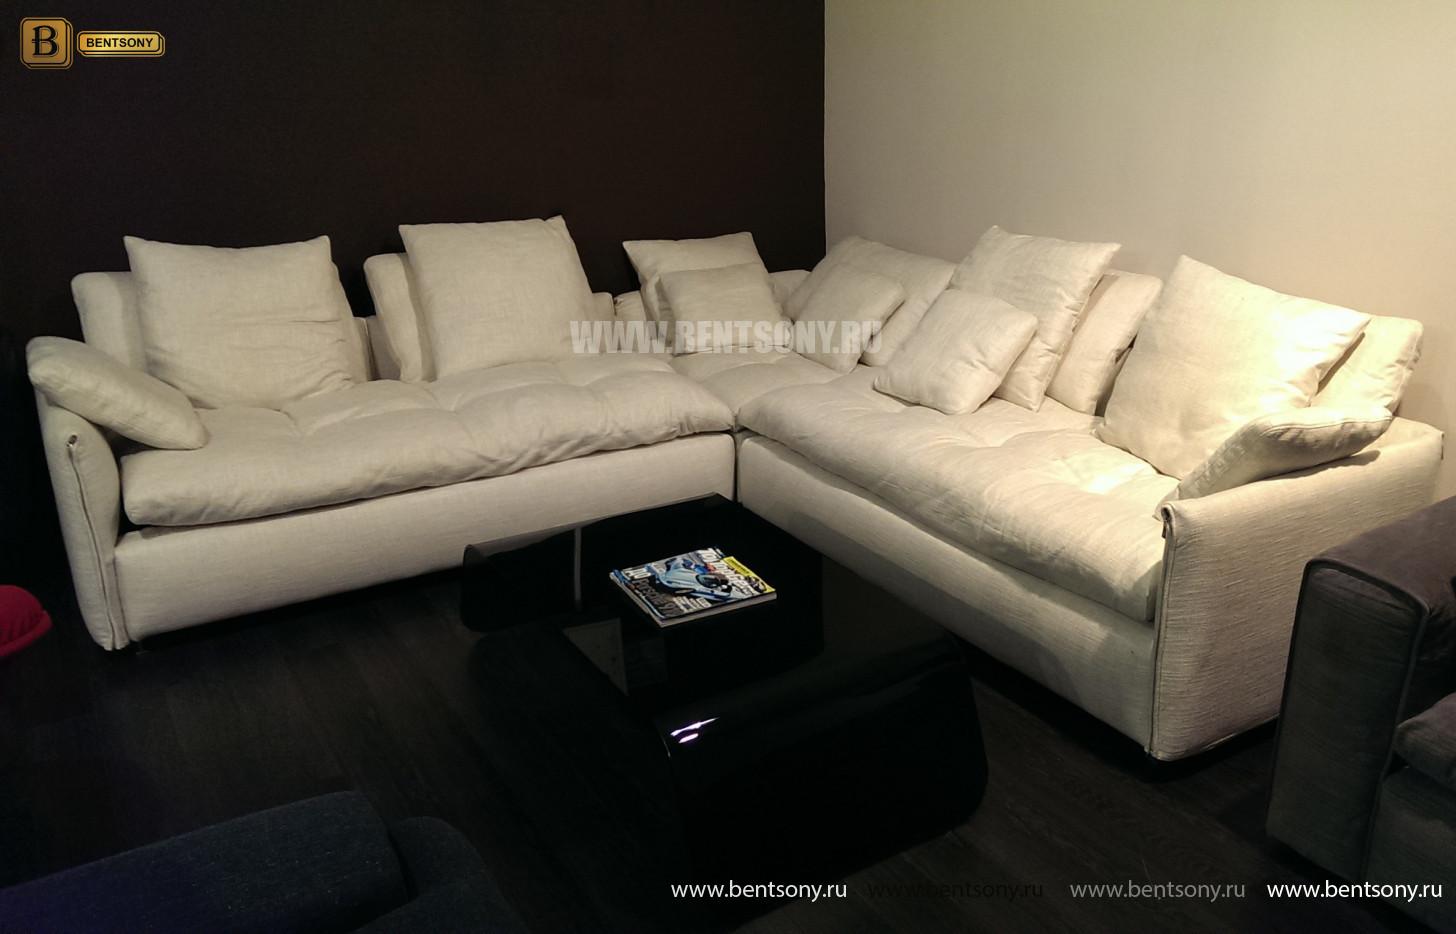 Угловой диван Арлетто с подушками